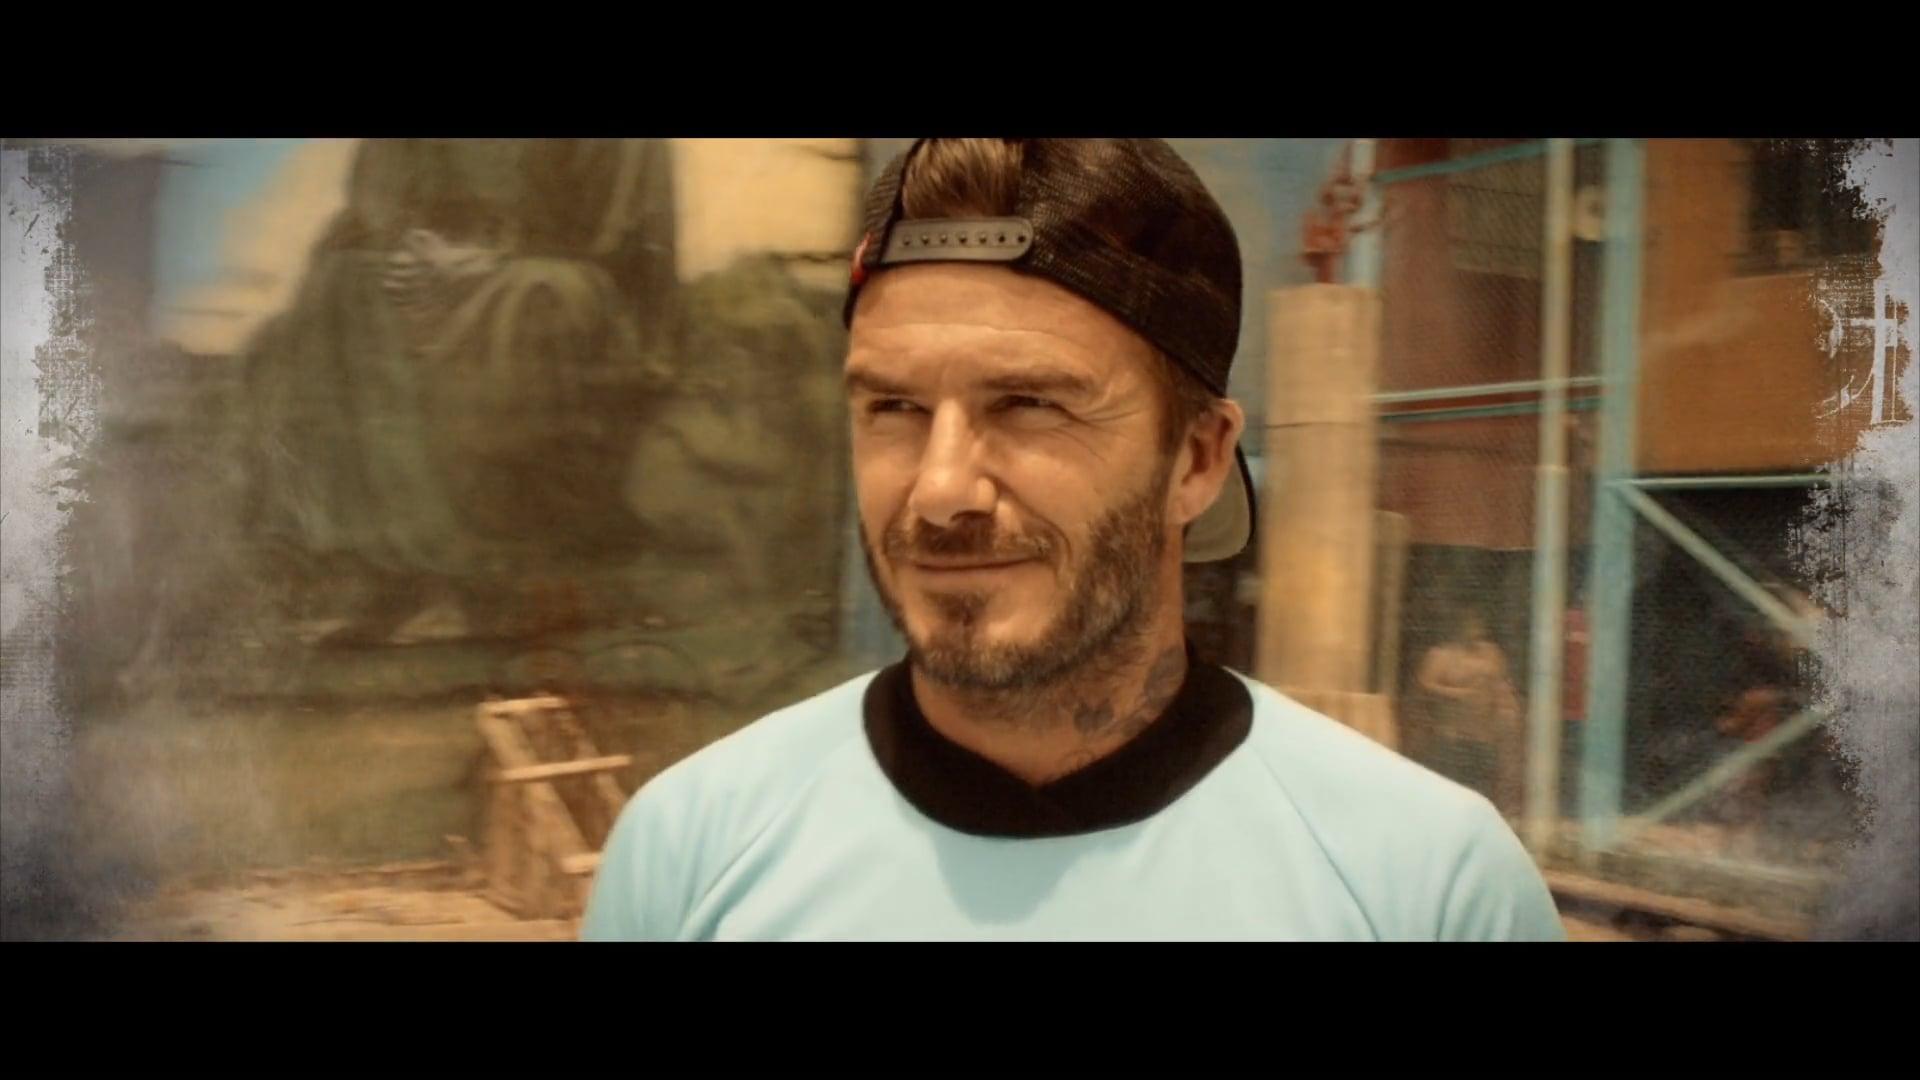 David Beckham - David Beckham For the Love of the Game // Production Company Big Earth // Director Ben Jones